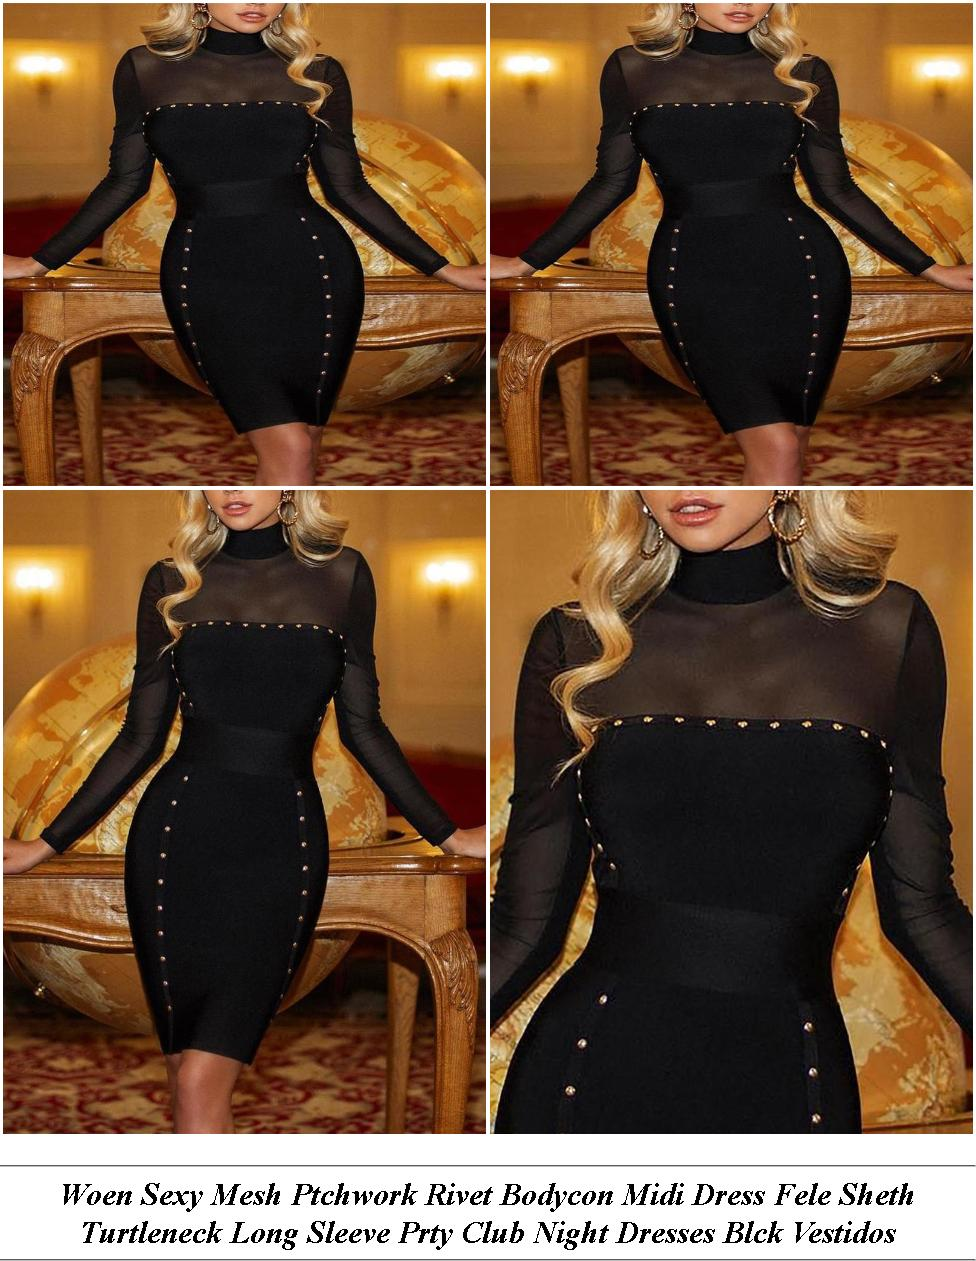 Sexy Maxi Dresses - Summer Maxi Dresses On Sale - Shift Dress - Cheap Womens Summer Clothes